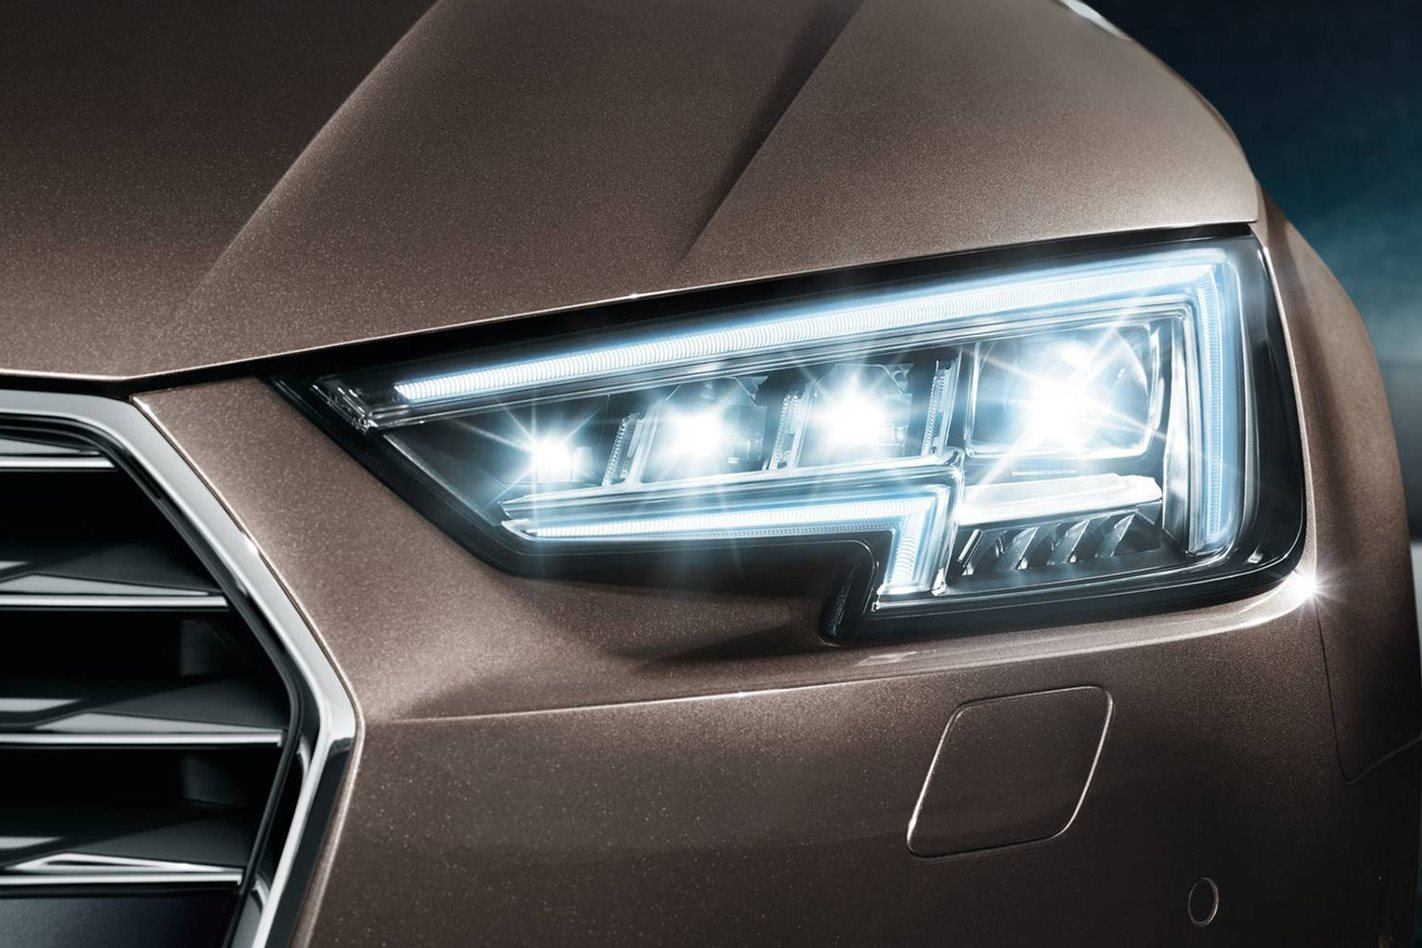 Black Car Lights Wallpaper Audi Matrix Led Headlight Technology Does It Work